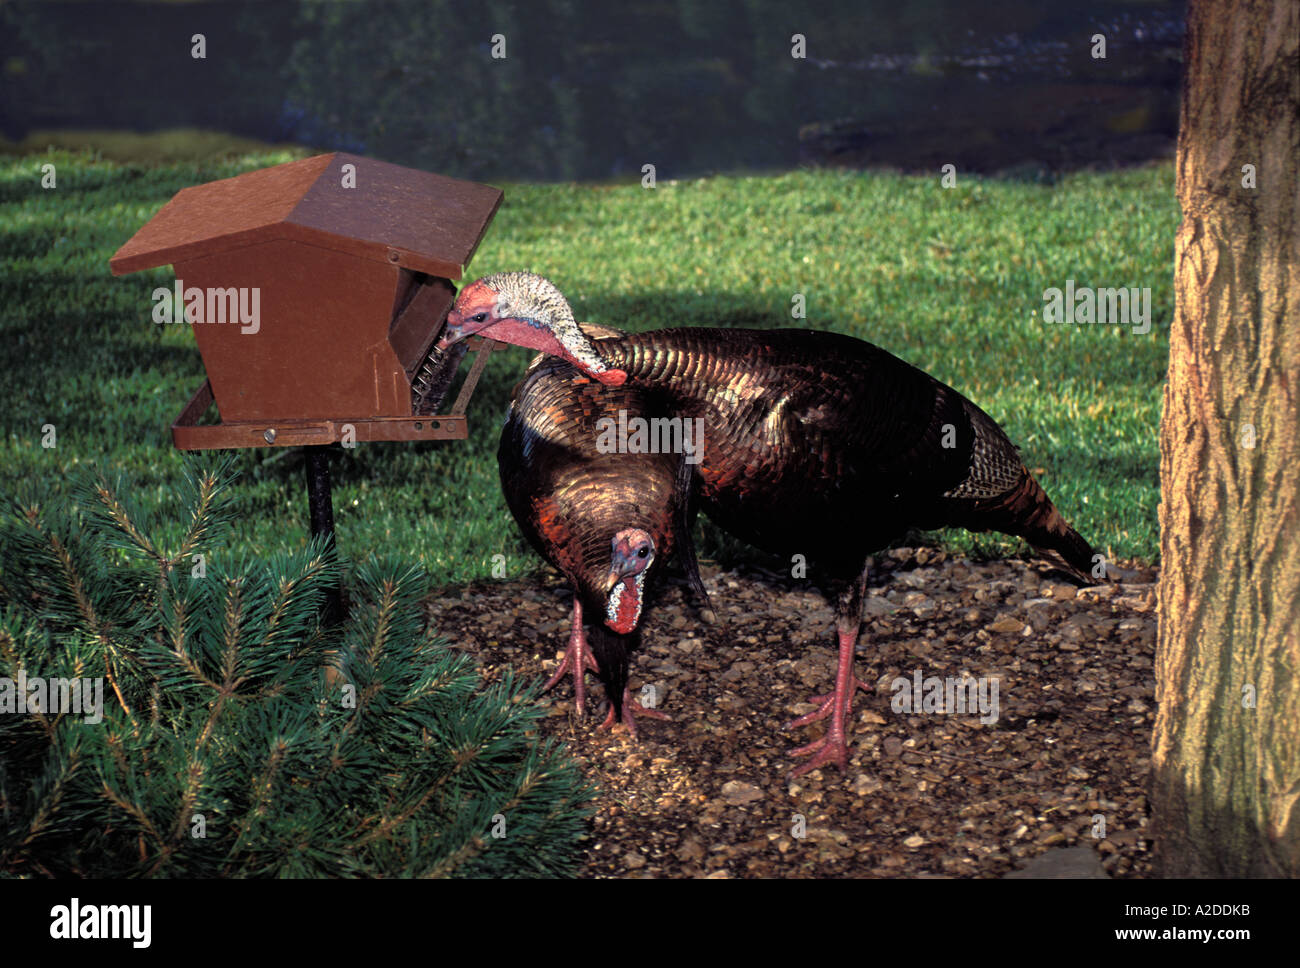 1fcef9e02c Turkeys are birds too  Two large wild turkeys feeding at home bird feeder  in garden